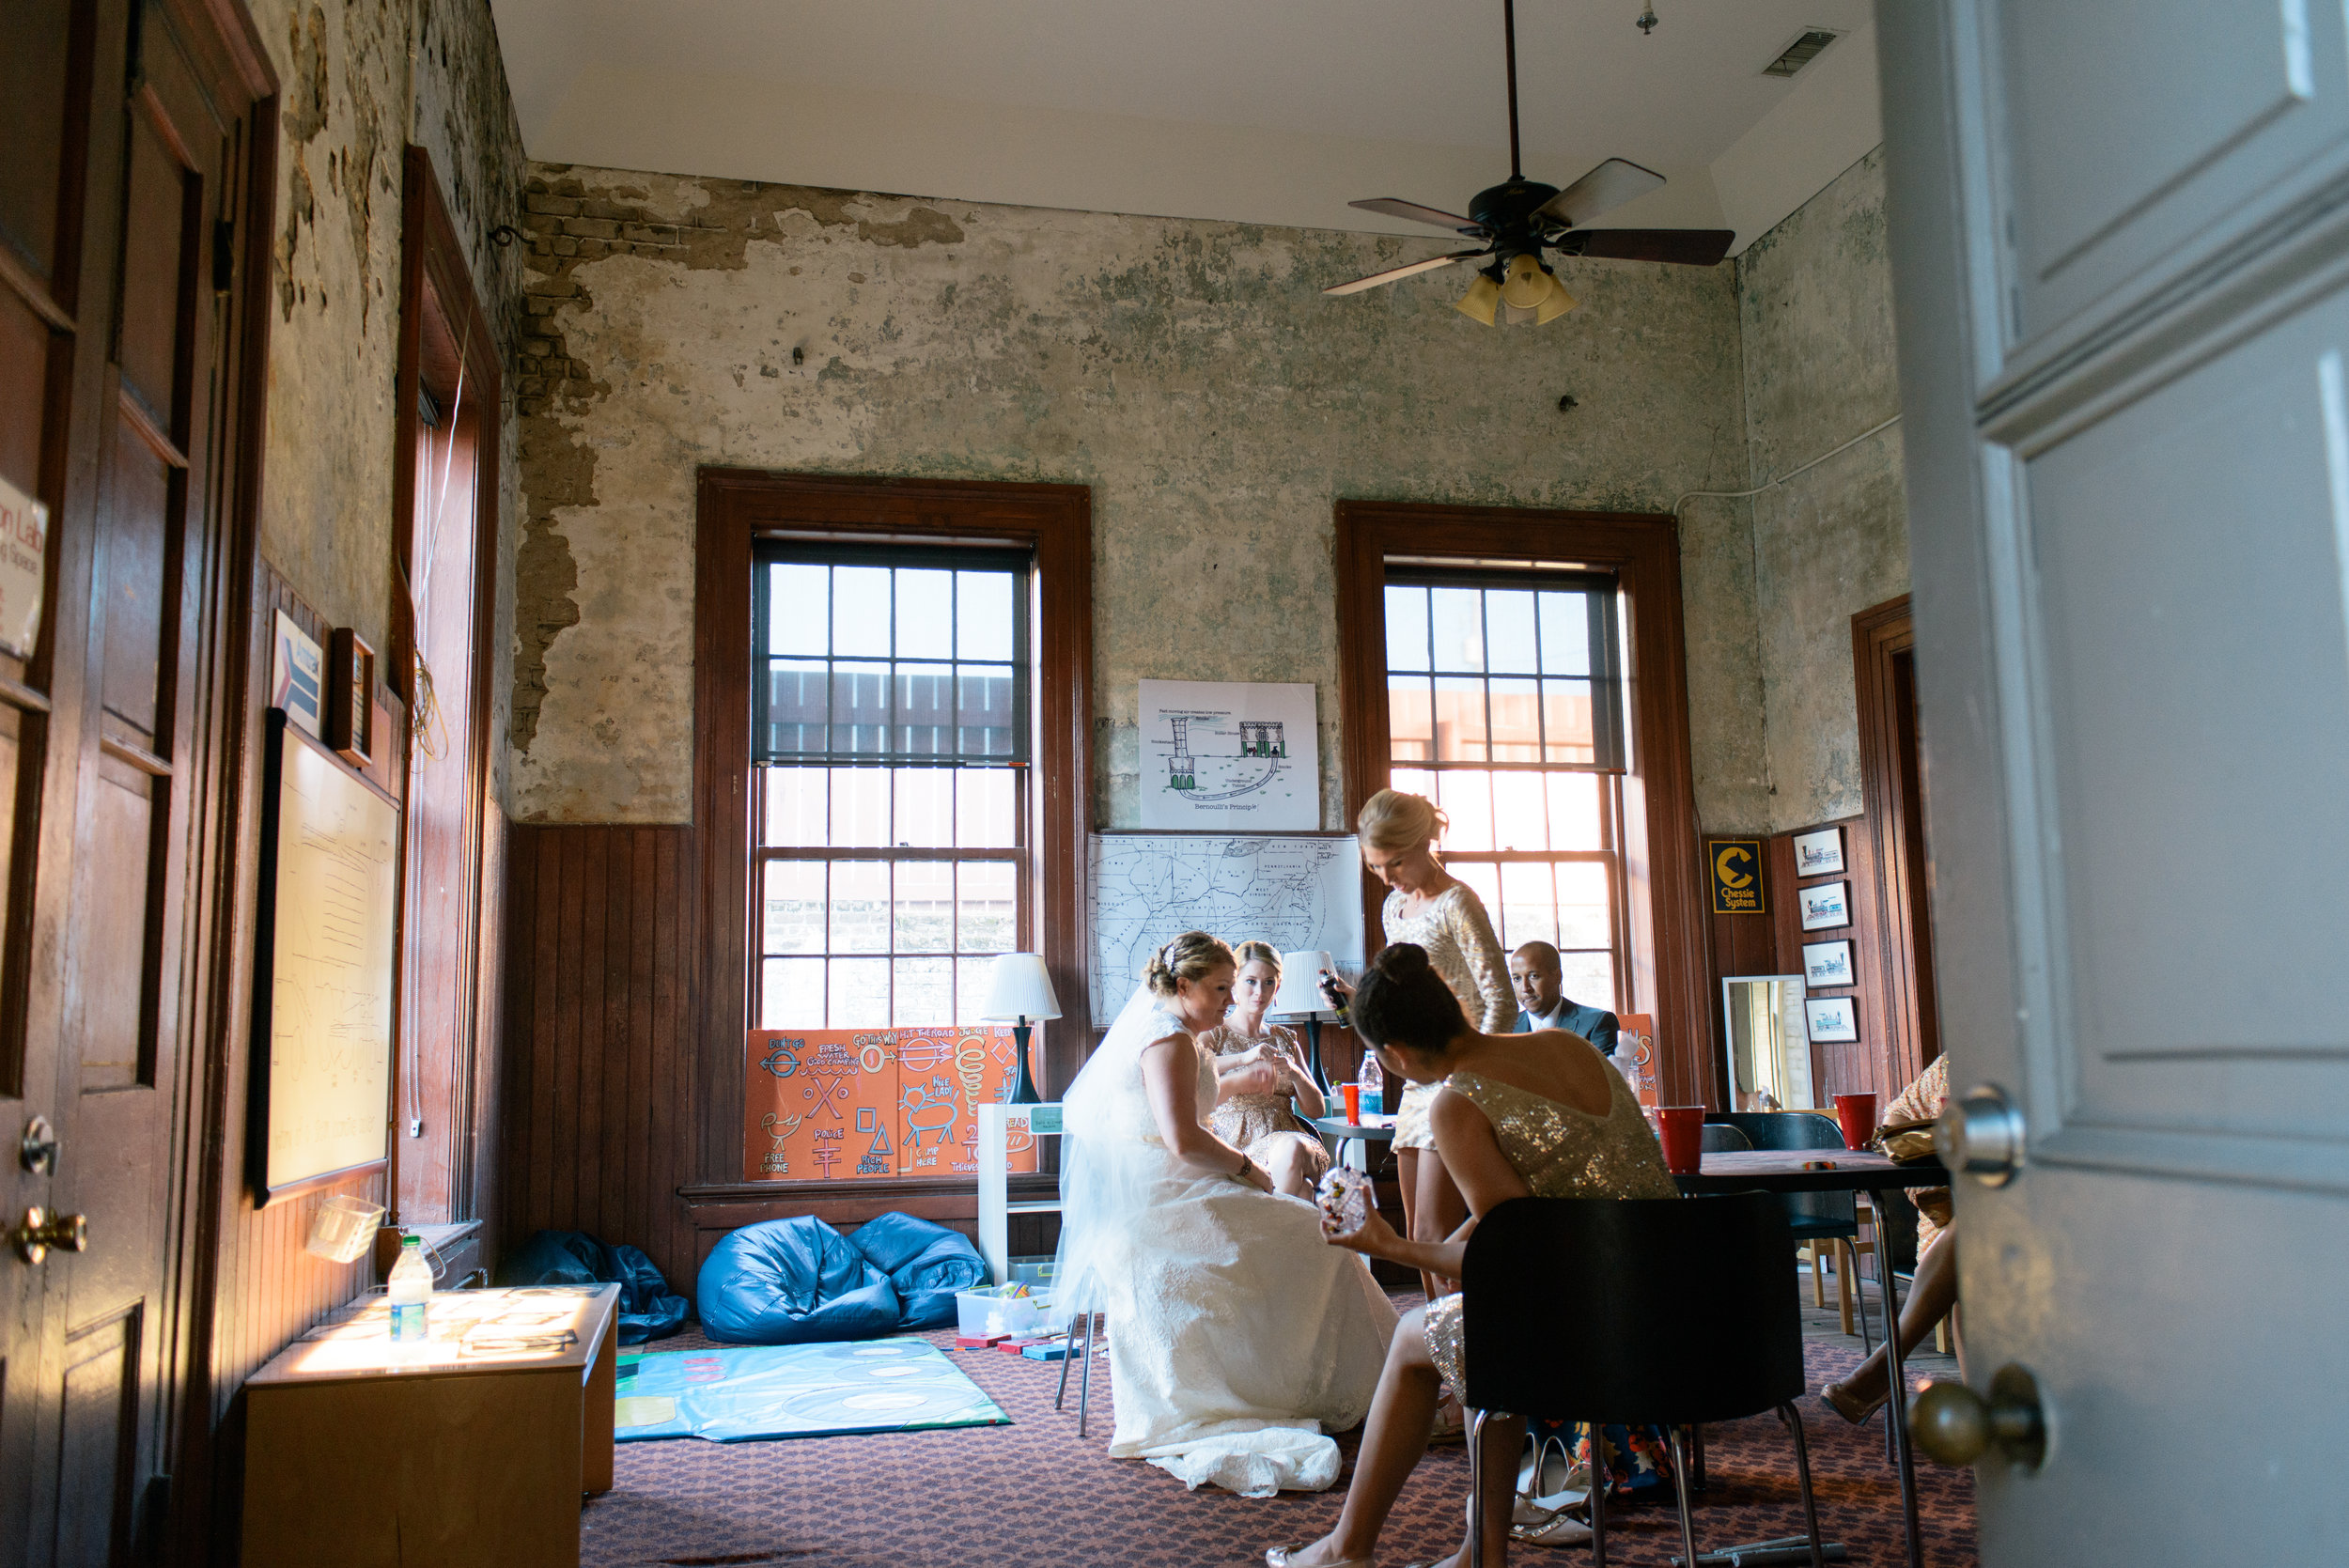 courtney-and-adam-railroad-museum-savannah-october-2016 (33 of 60).jpg